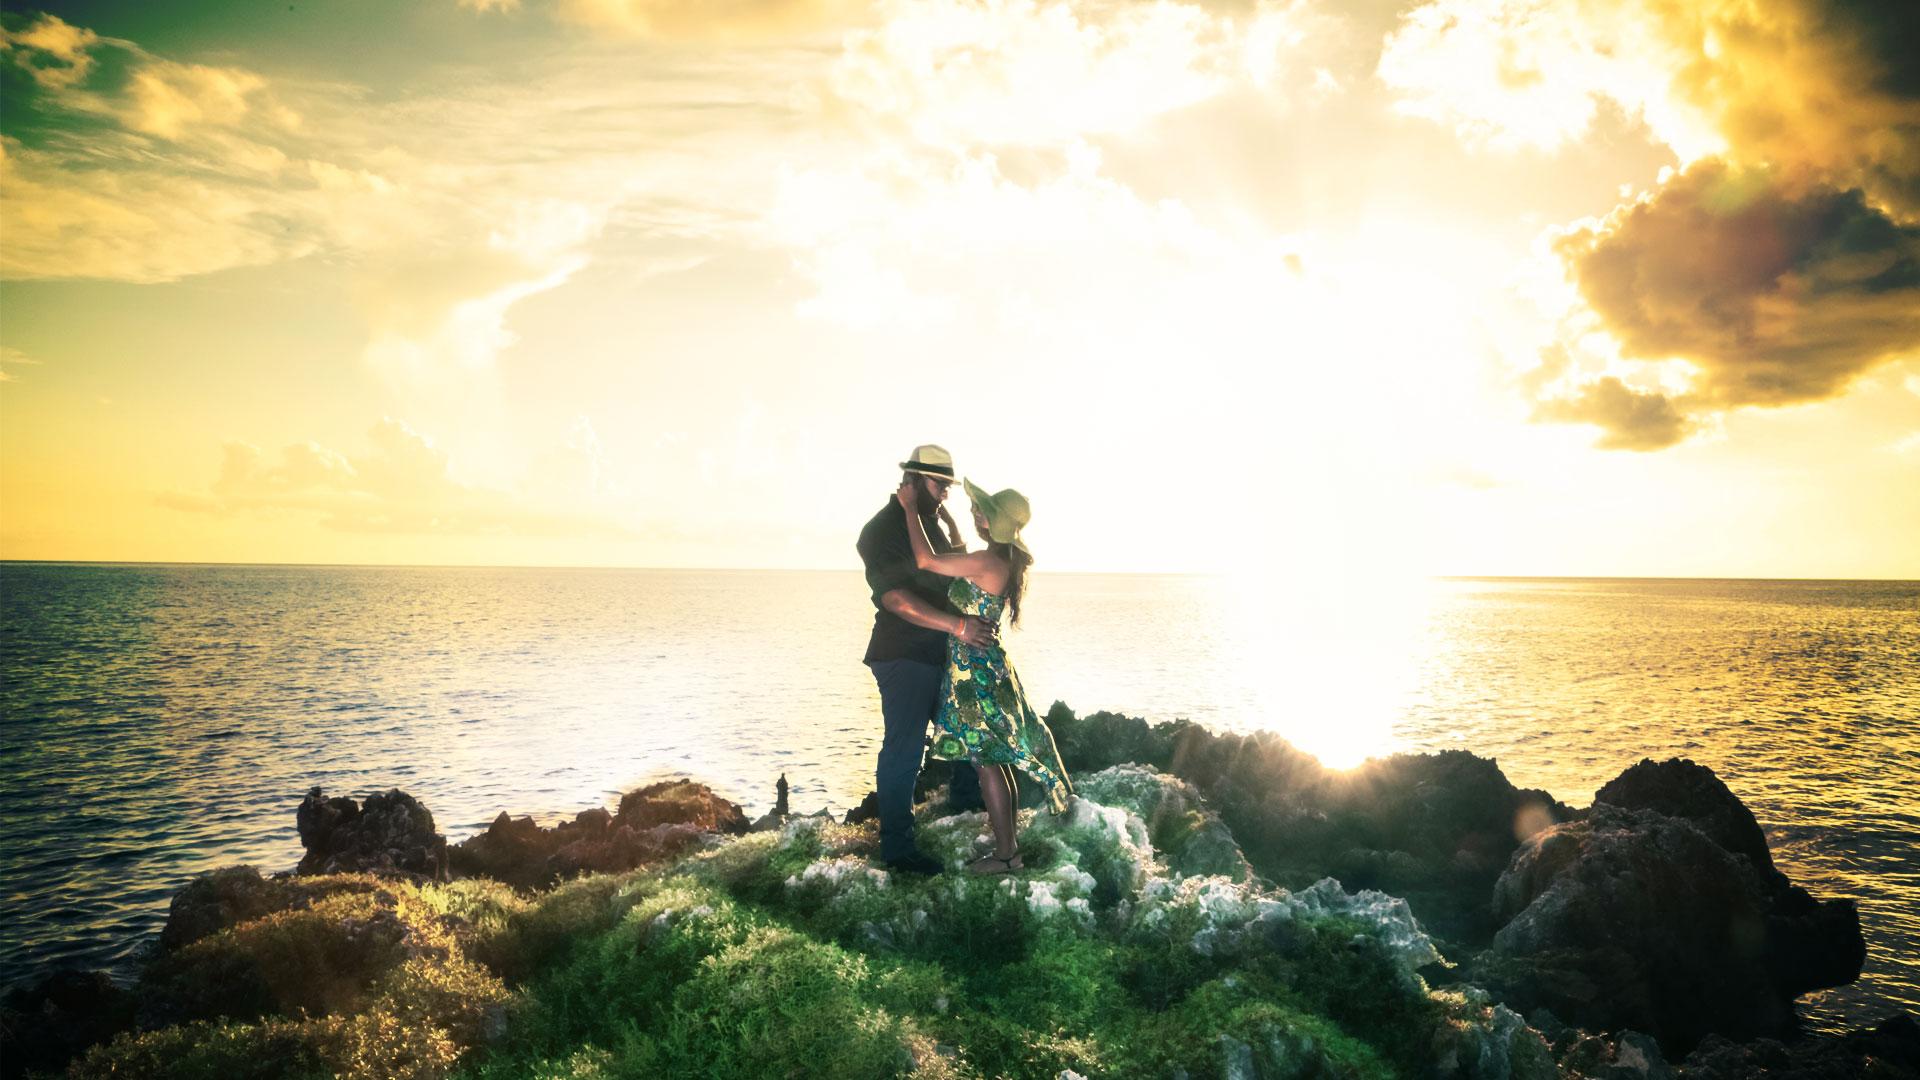 epic_sky_pictures_eshoot_island_reef_sunset_vancouver_toronto_los_angeles_bride_groom_wedding_photos_creative_sundown_romantic_1920x1080